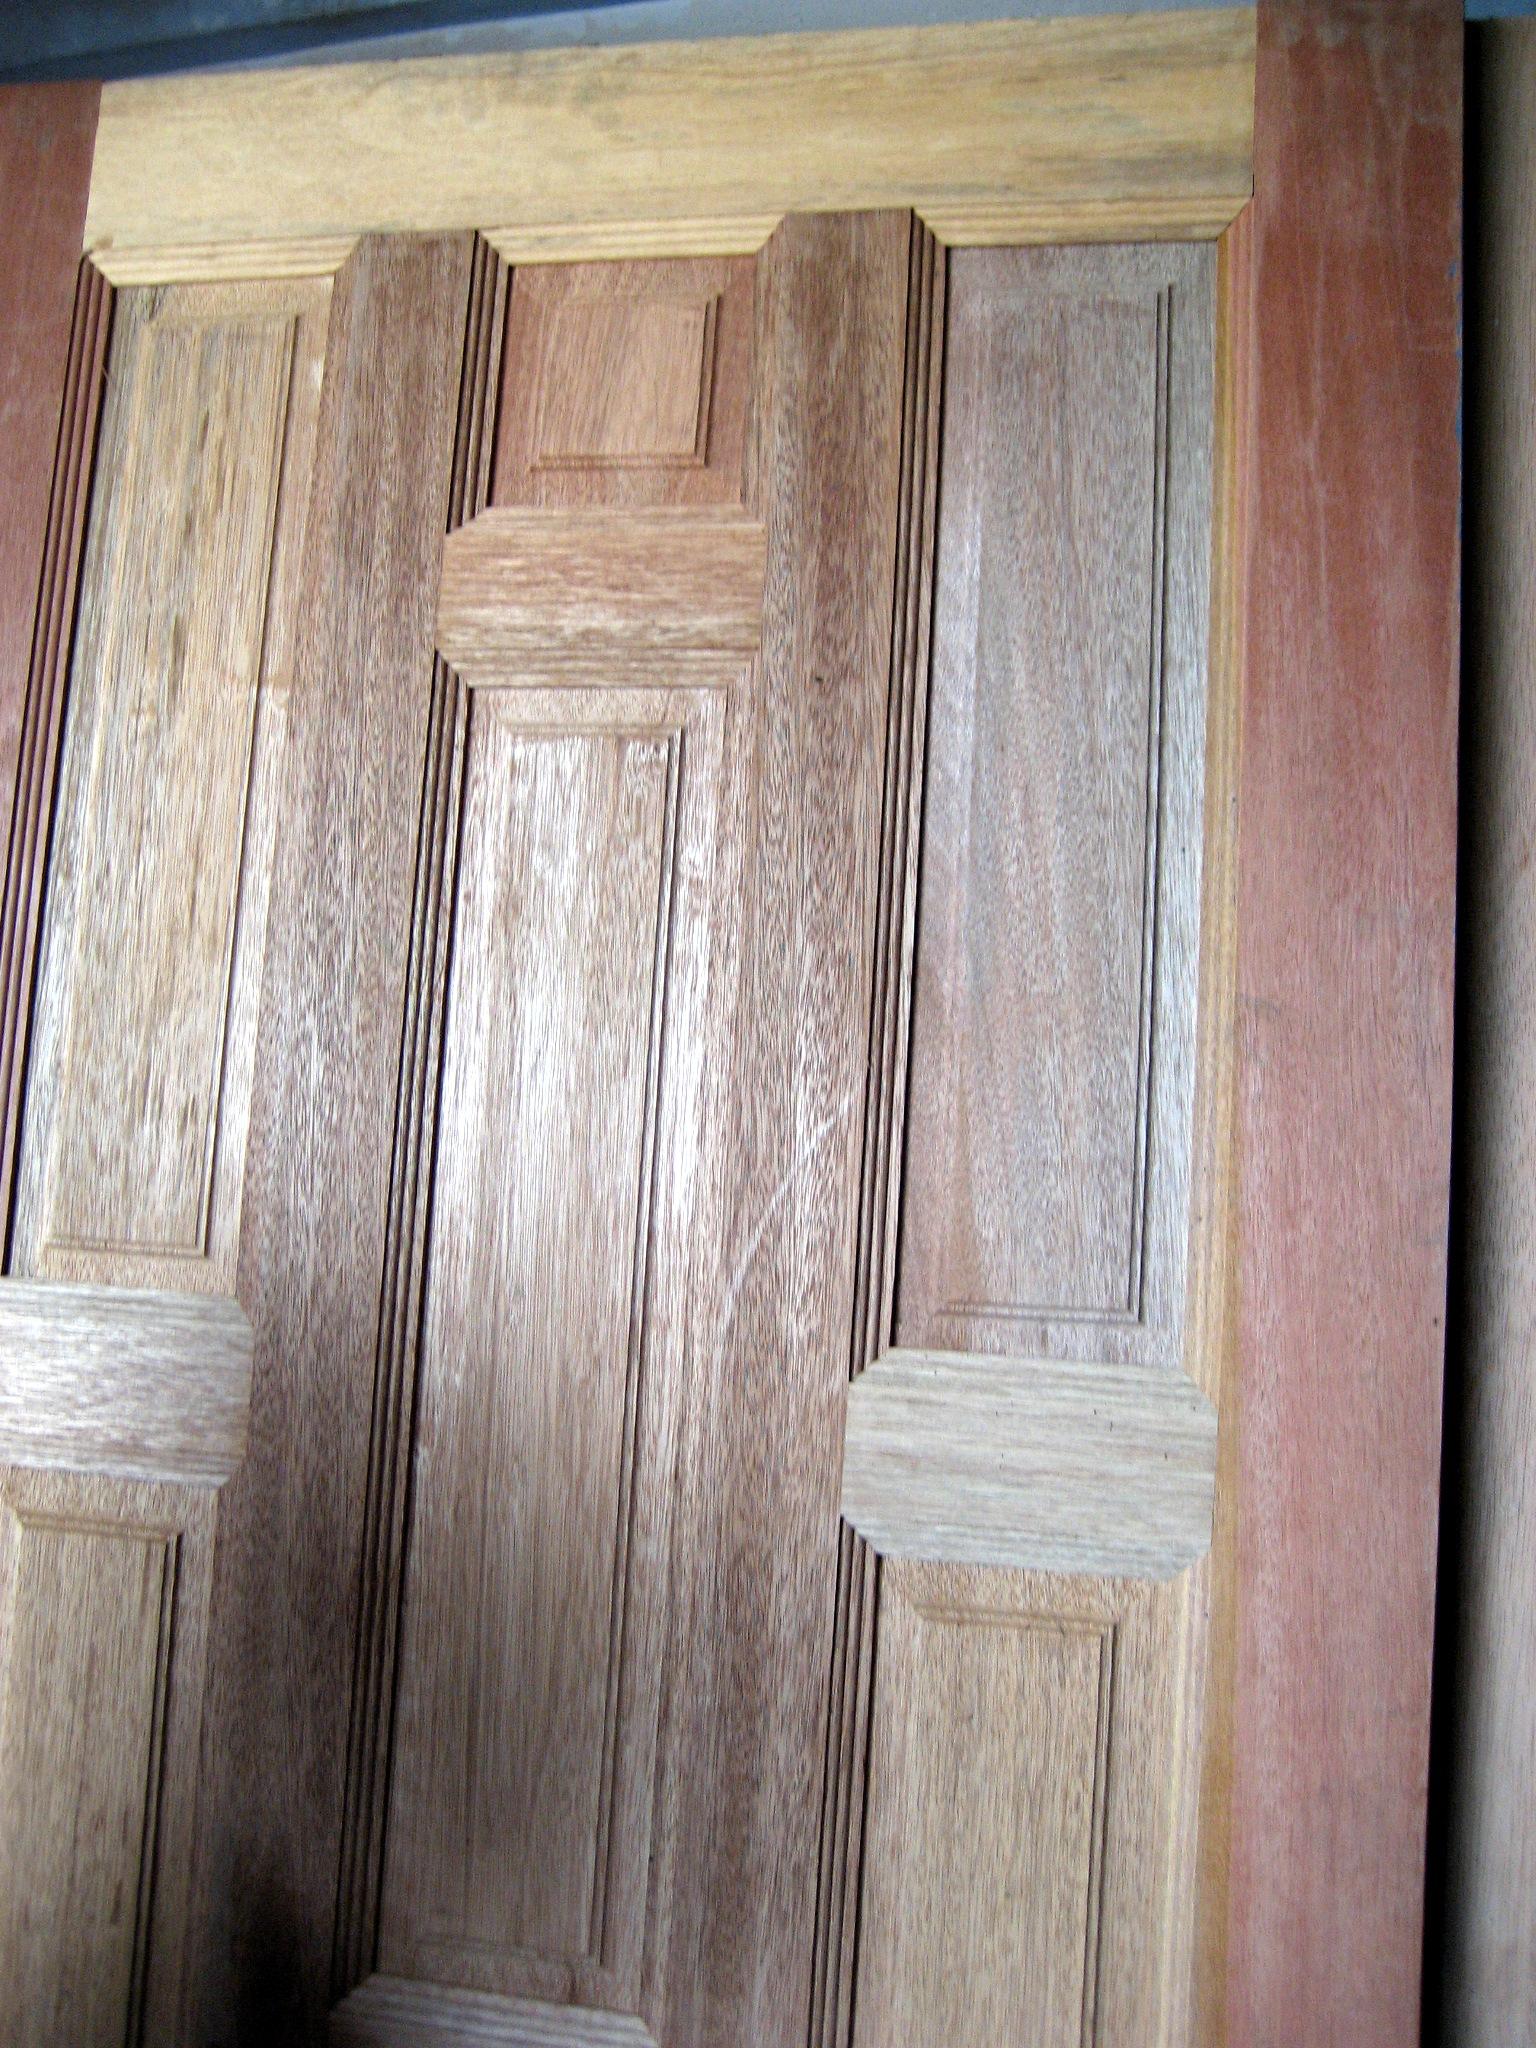 File:Thai House Door.JPG & File:Thai House Door.JPG - Wikimedia Commons Pezcame.Com